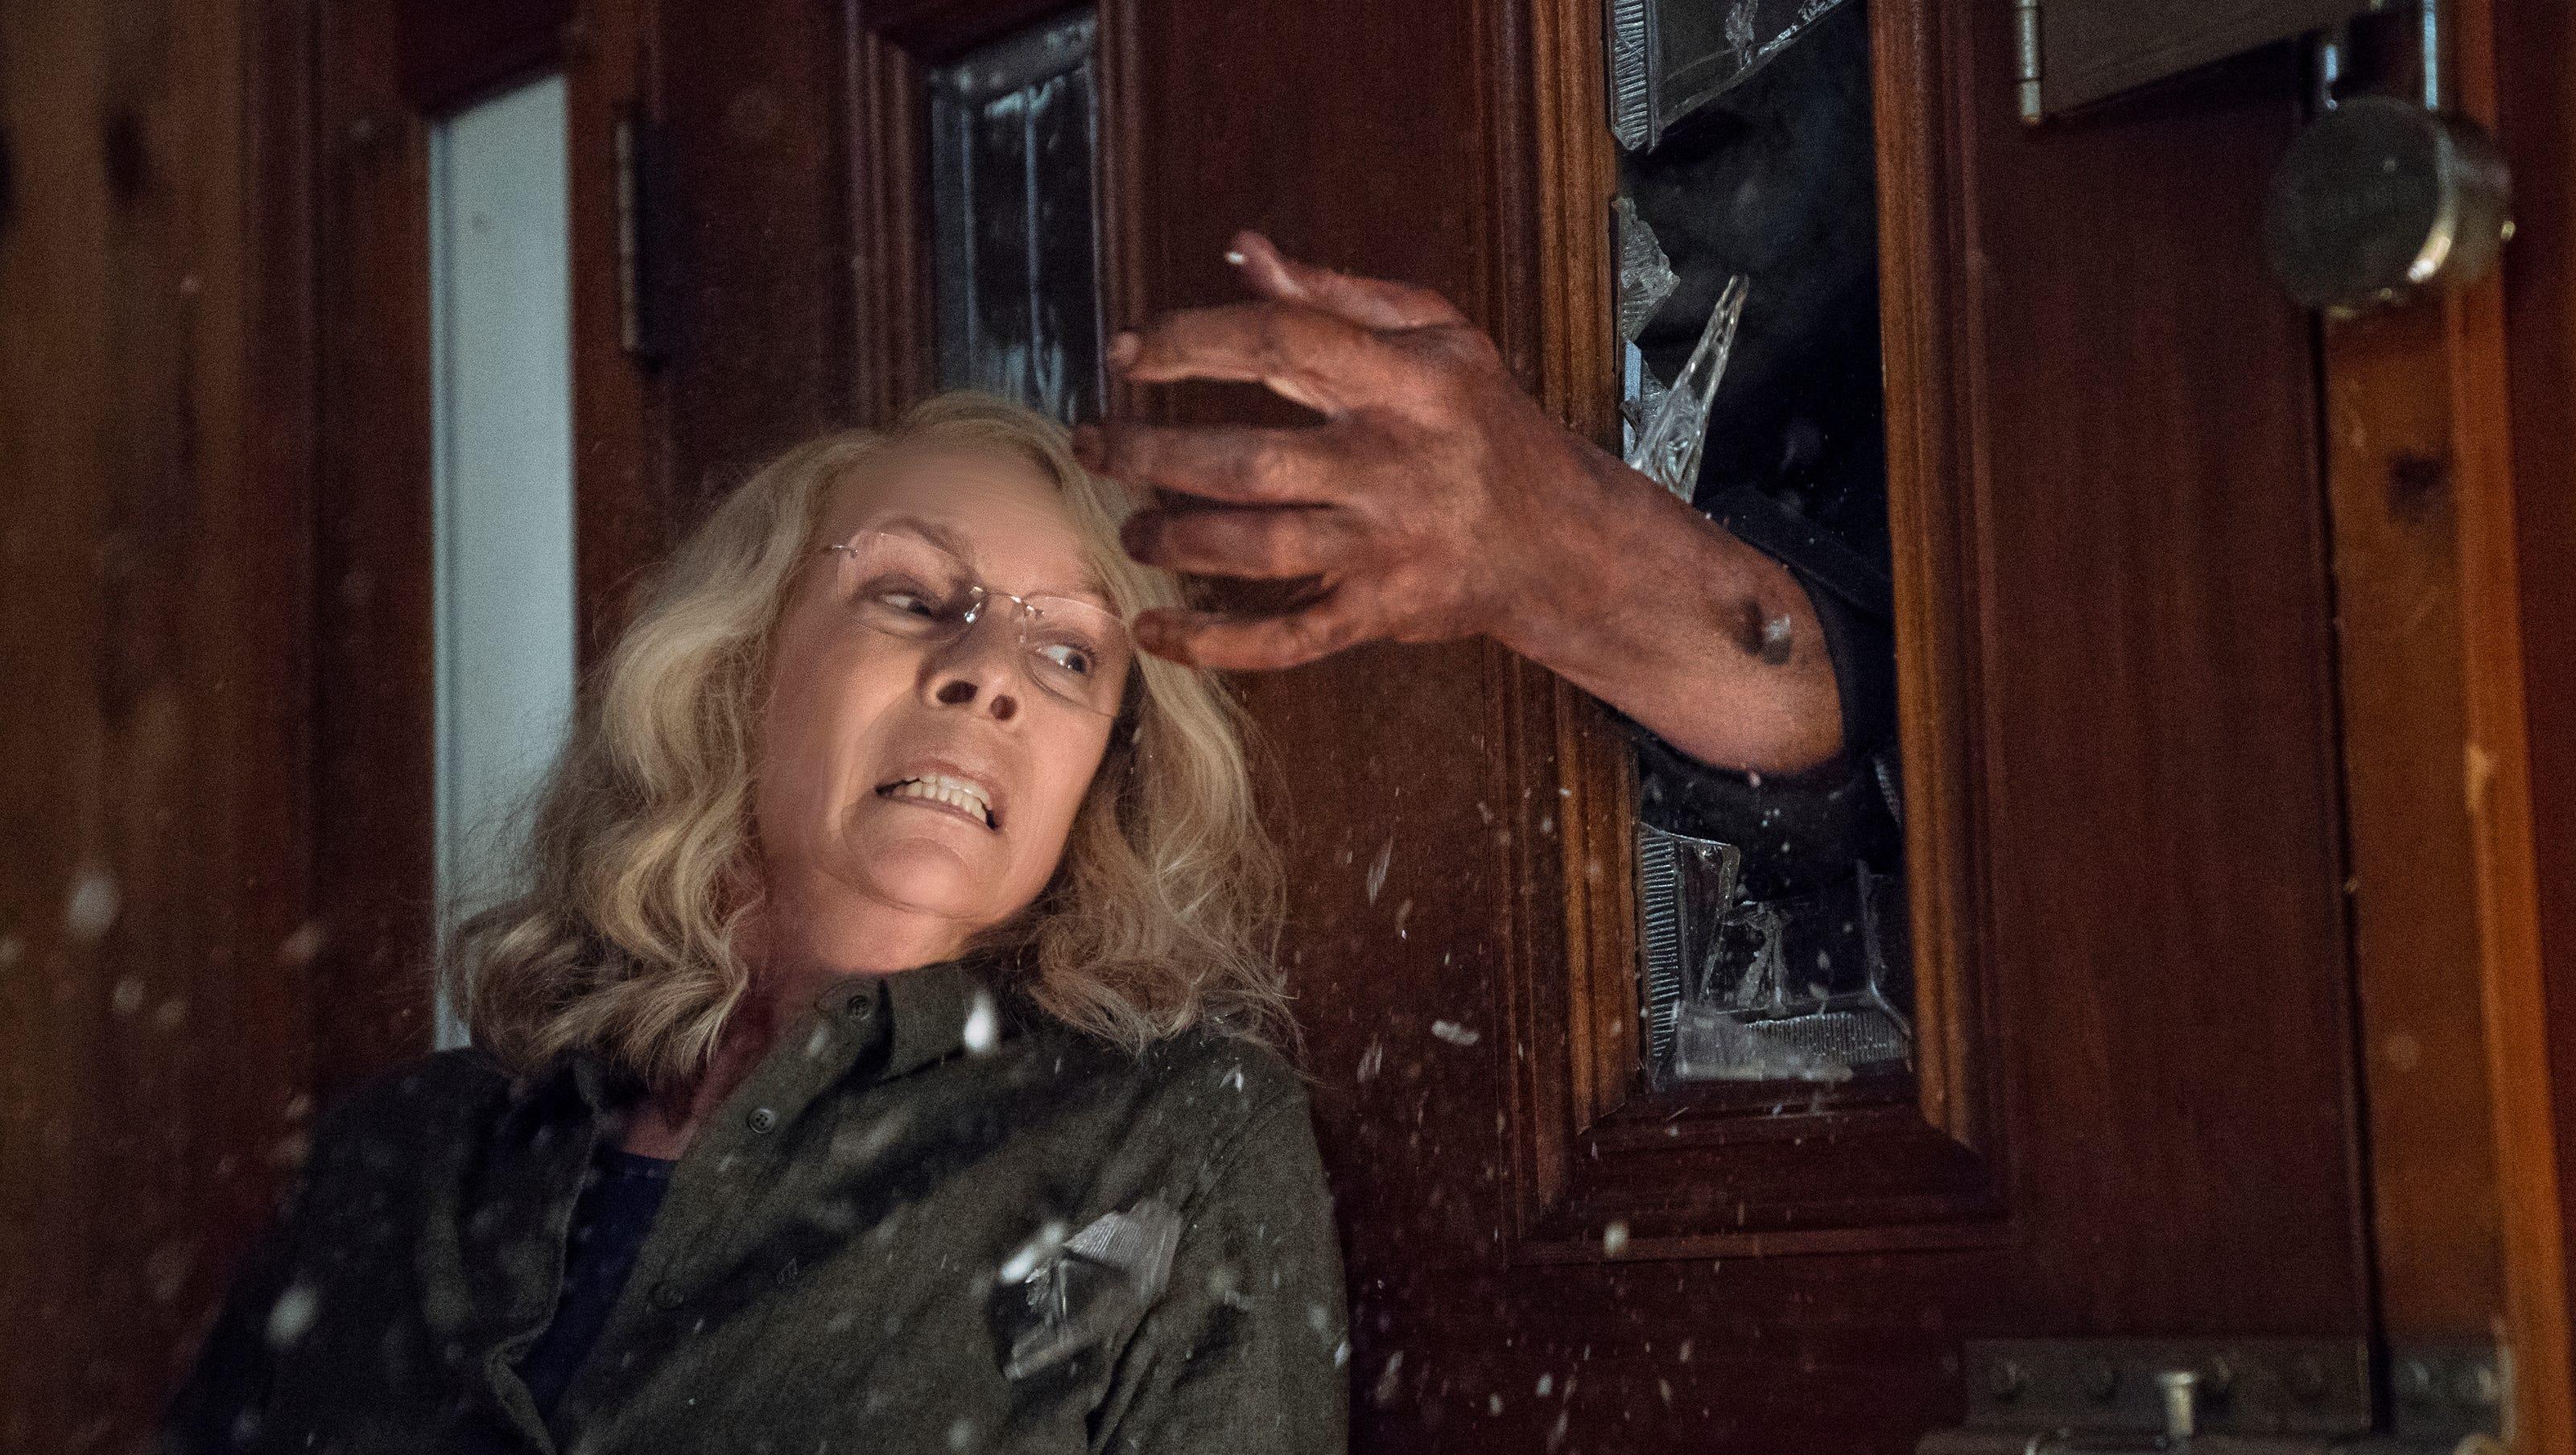 10 must-see horror films, including jamie lee curtis' new 'halloween'